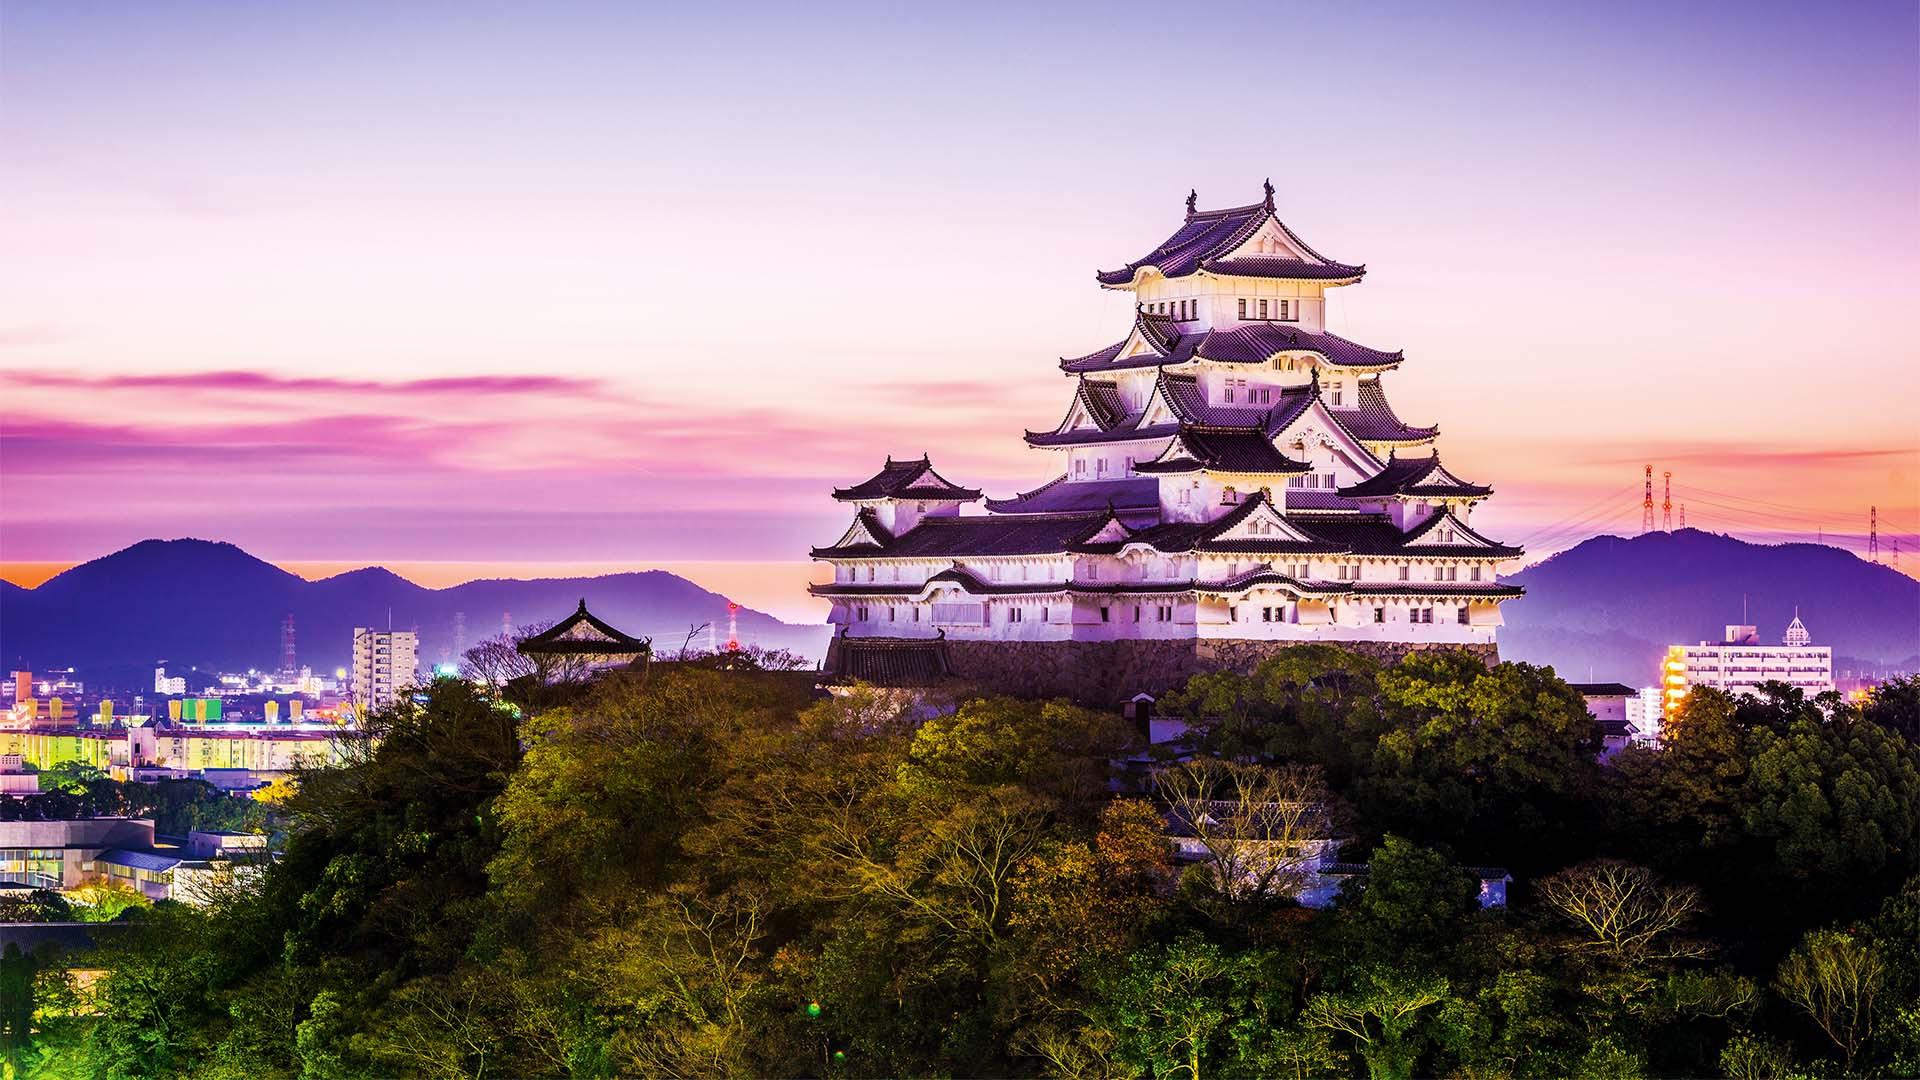 Himeji, Japan dawn at Himeji Castle.